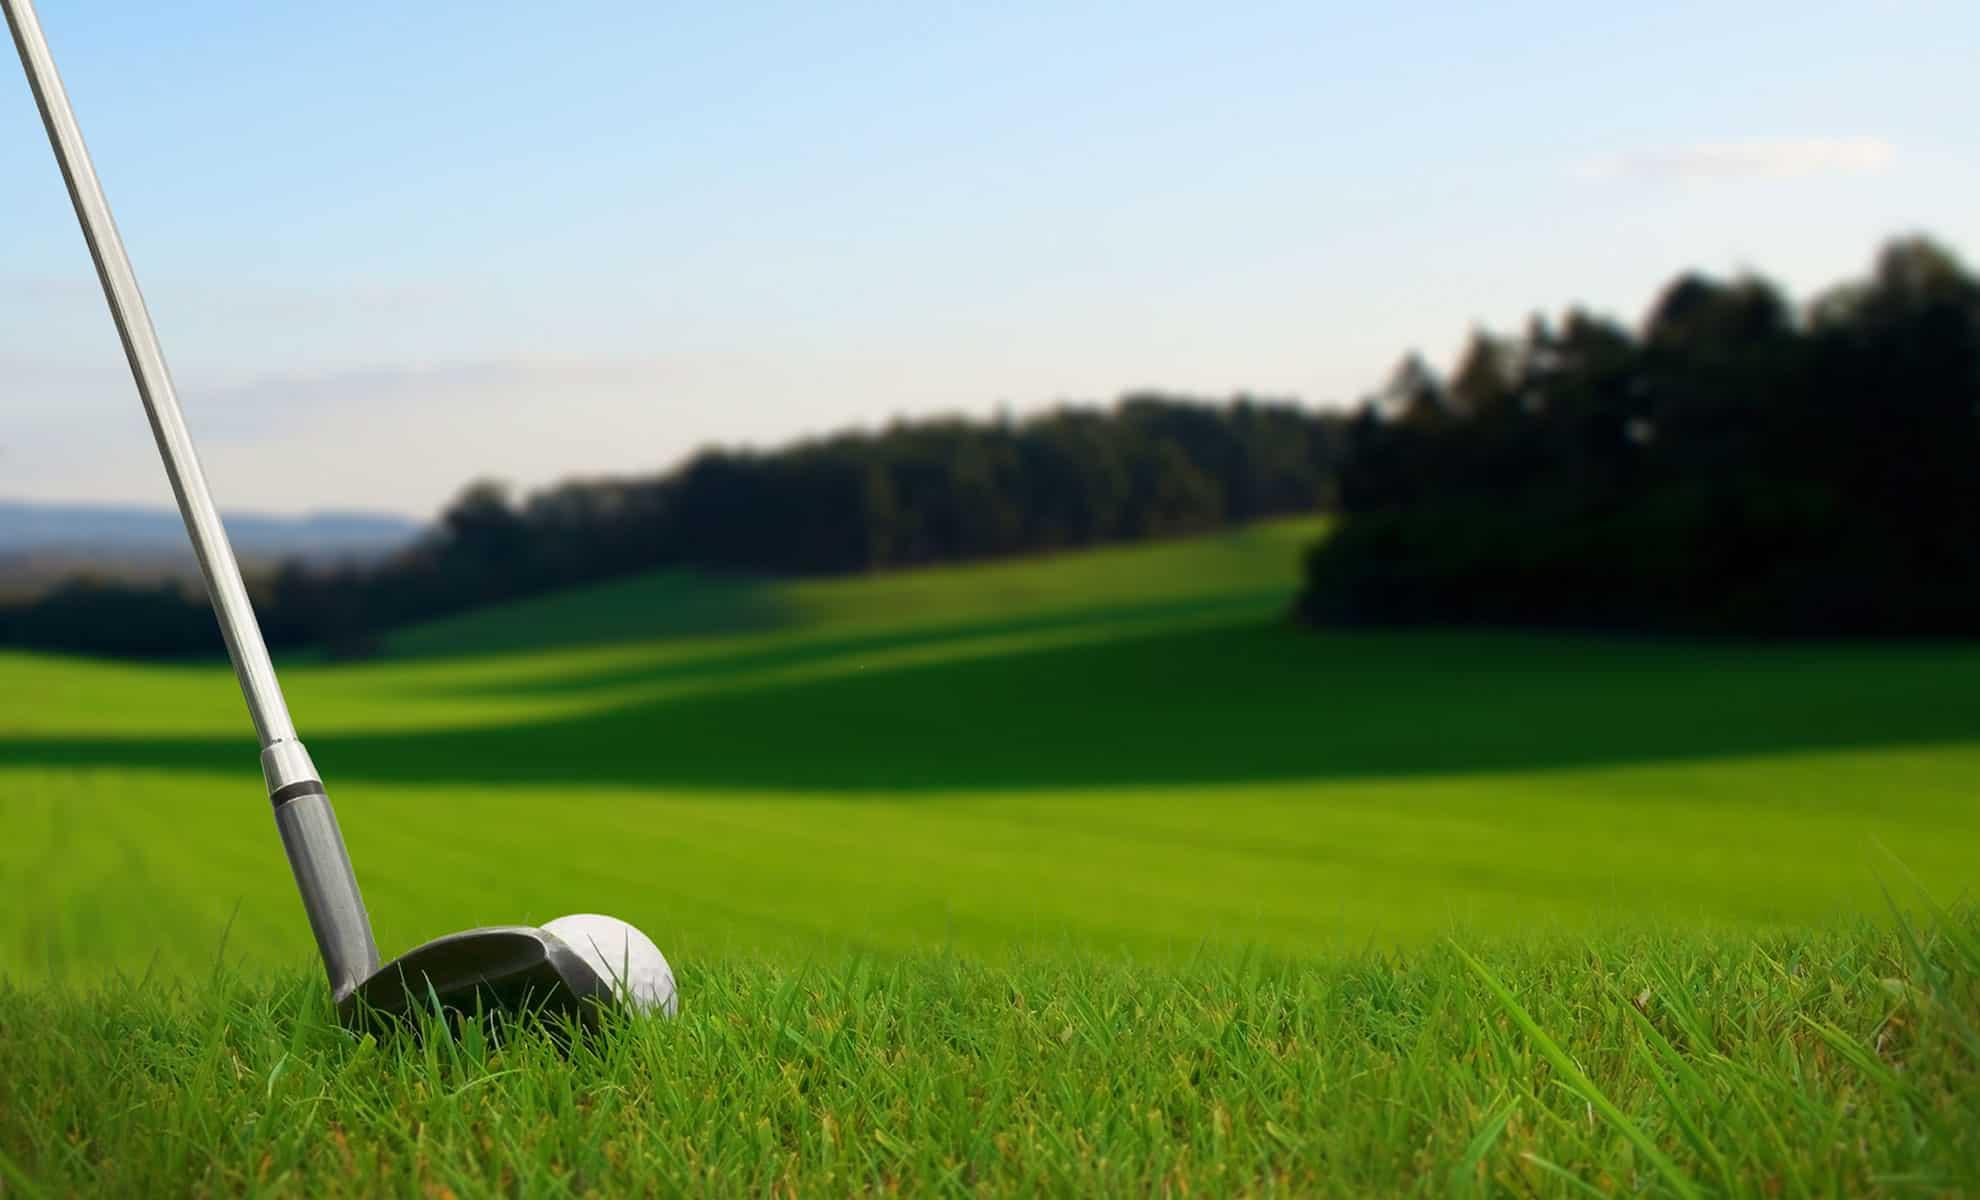 Autumn 2020 Golf Holidays